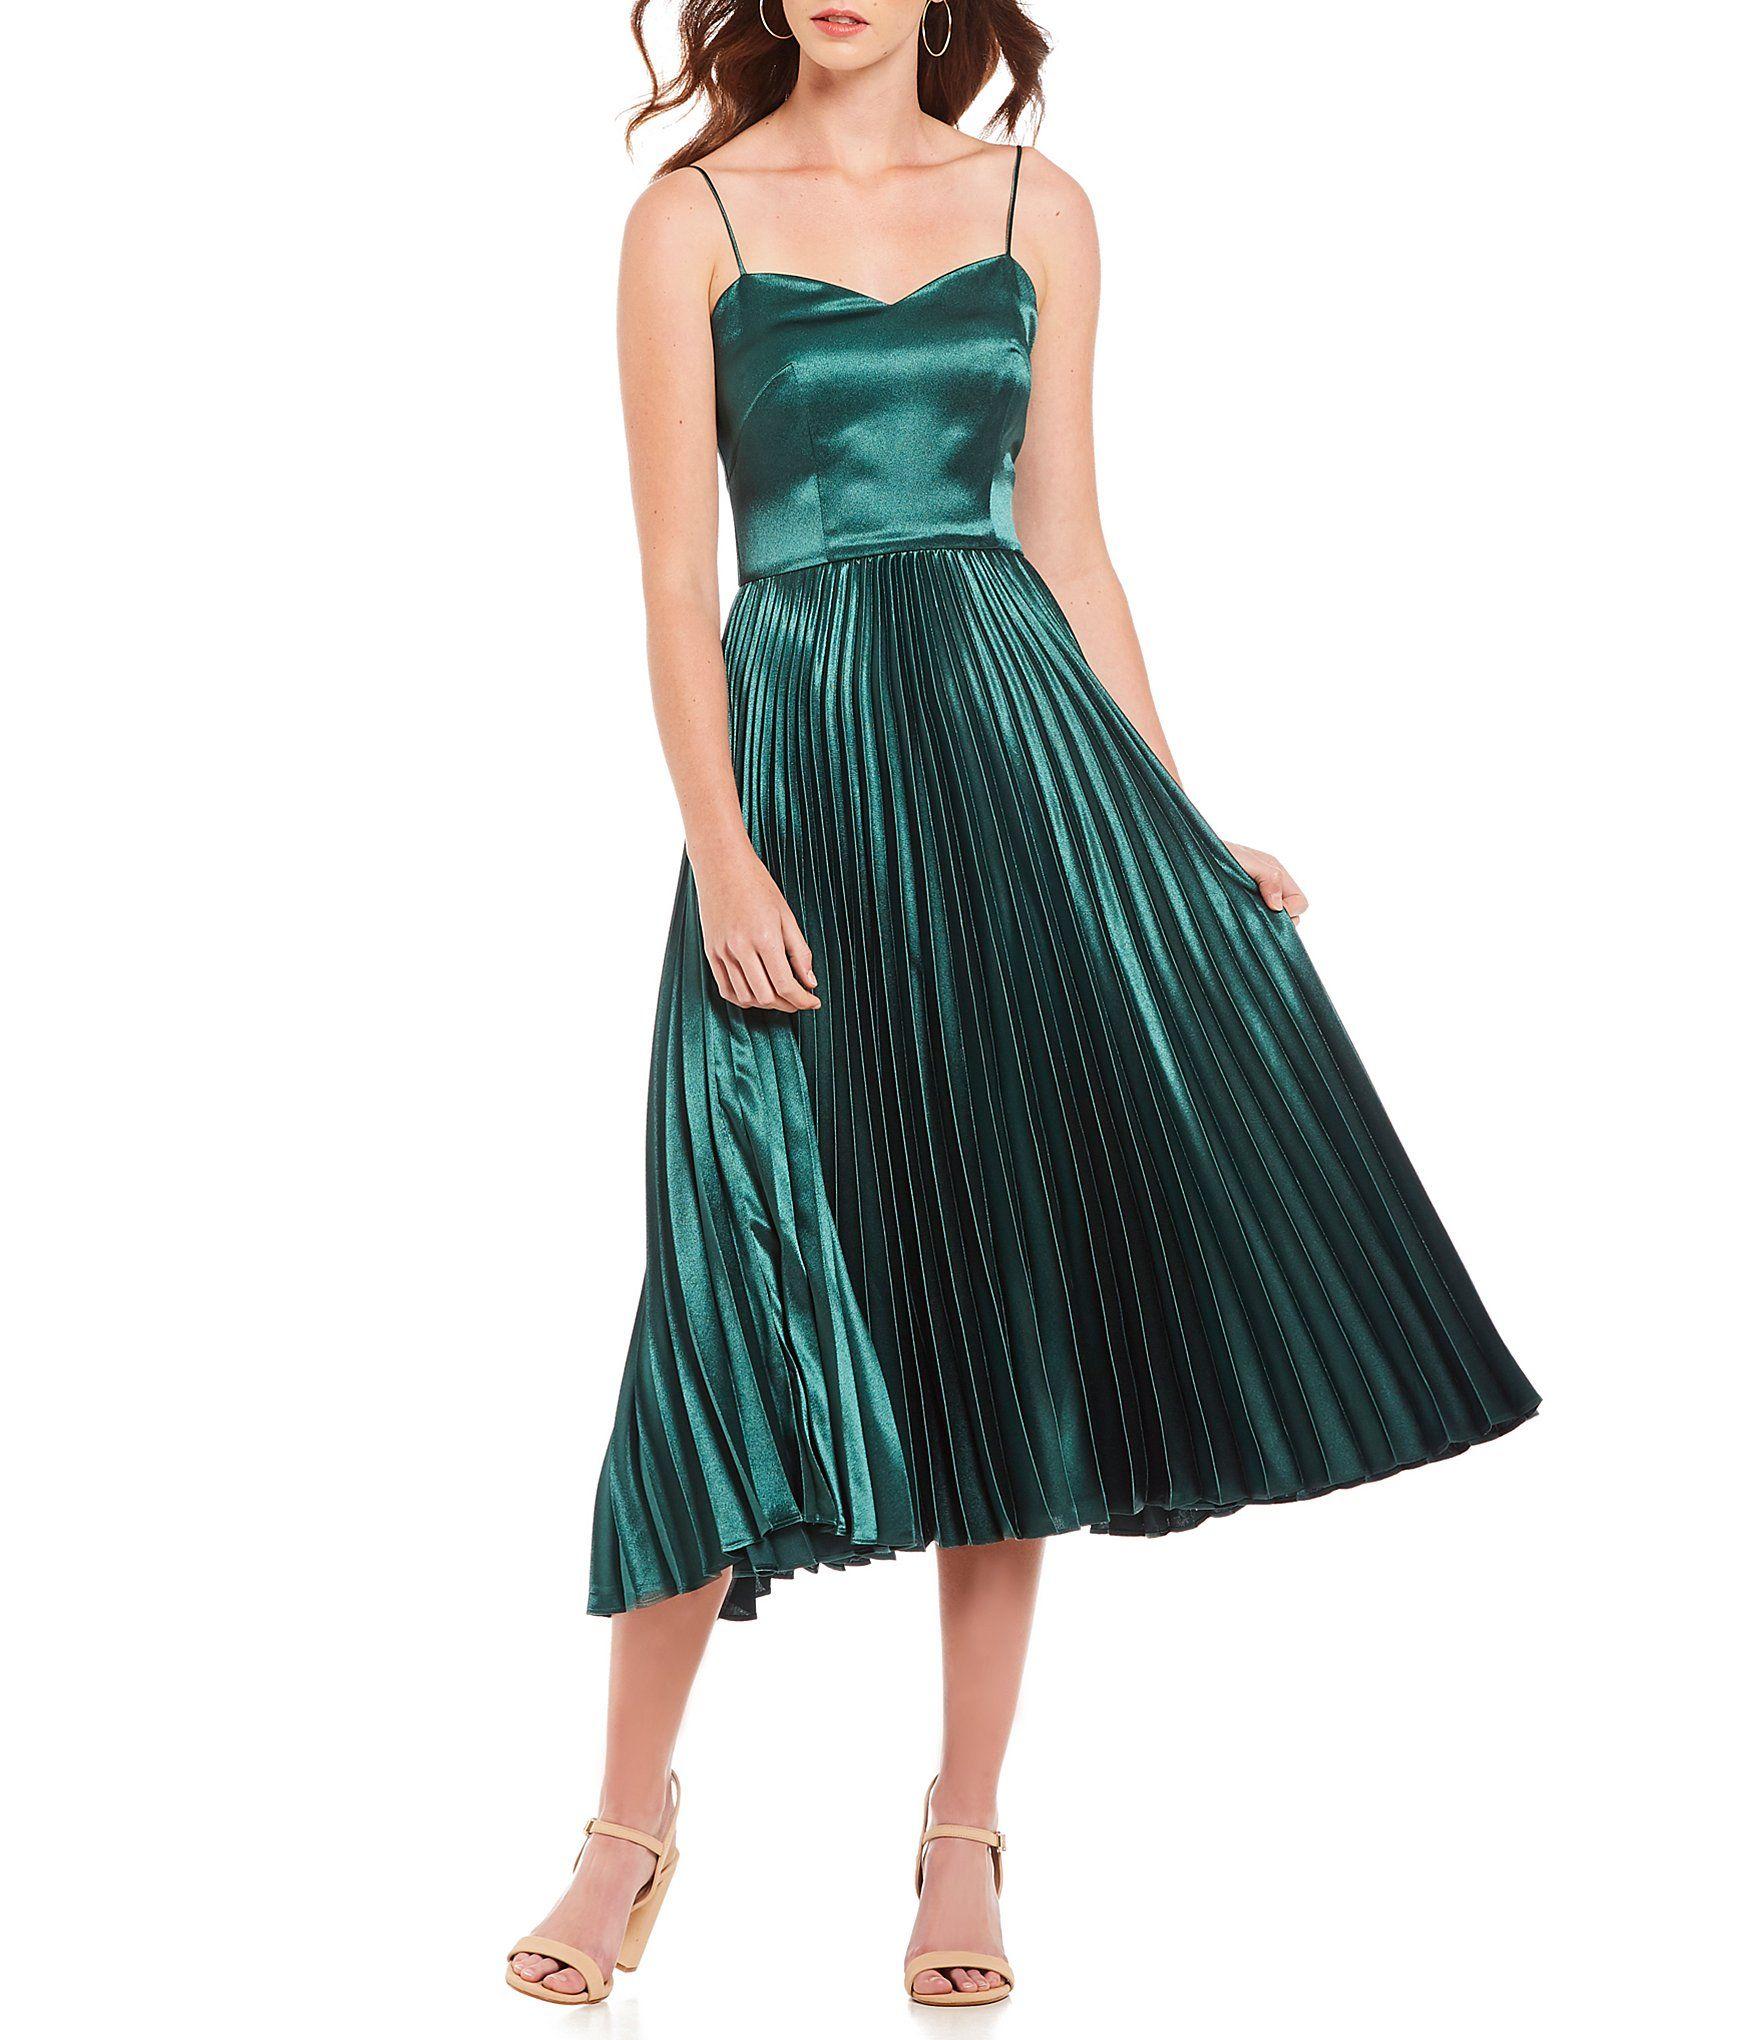 861e4999a77 Shop for Gianni Bini Romee Sweetheart Neck Spaghetti Strap Satin Accordion  Pleated Midi Dress at Dillards.com. Visit Dillards.com to find clothing